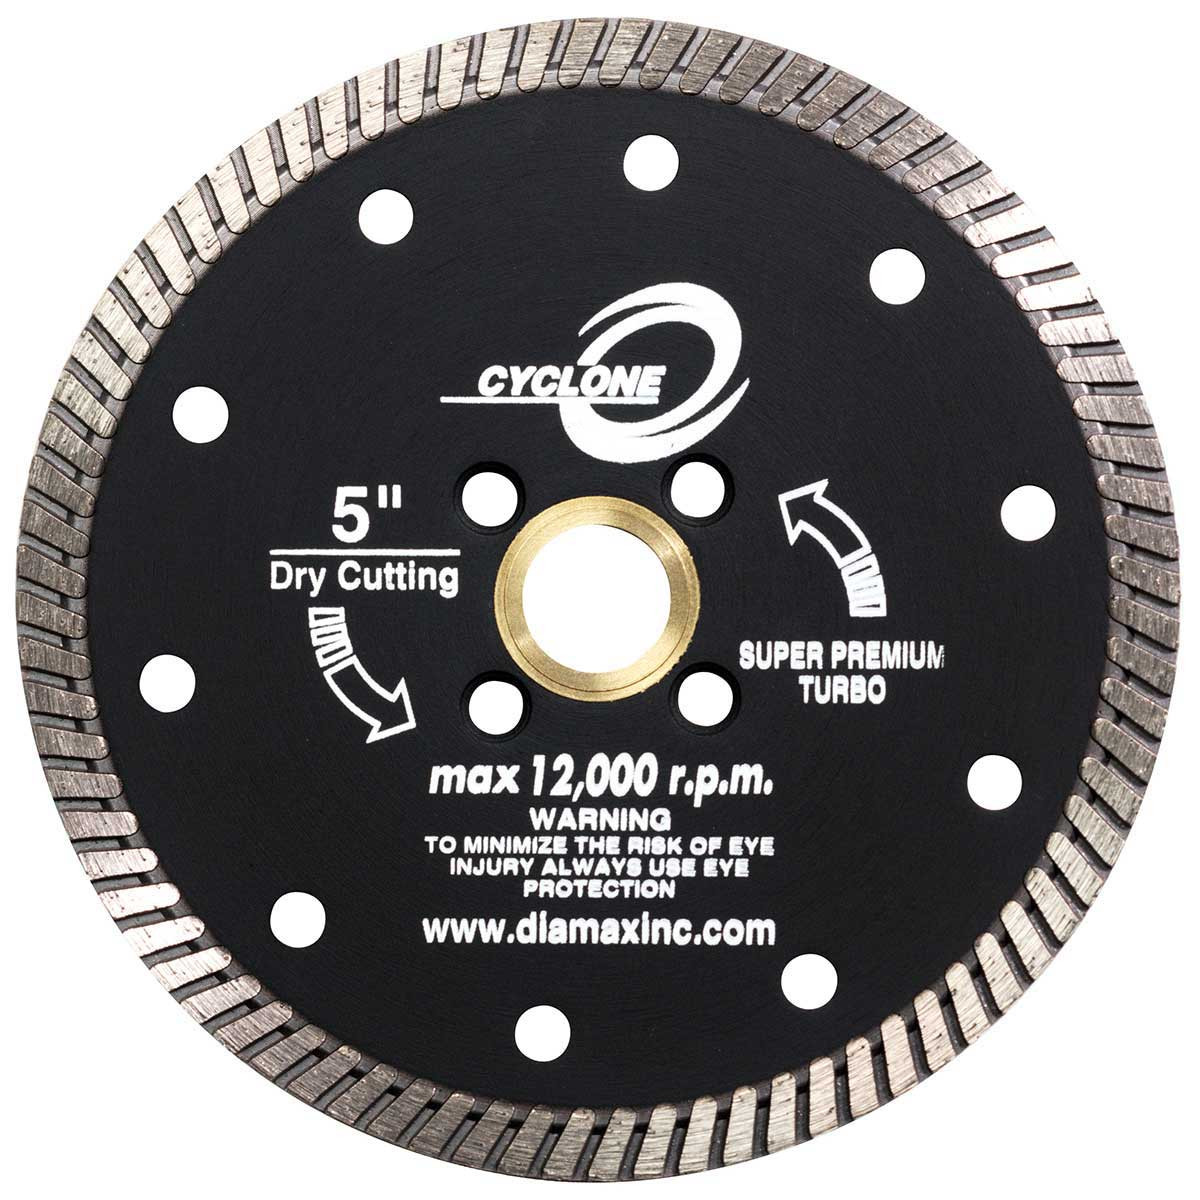 diamax cyclone granite turbo blade